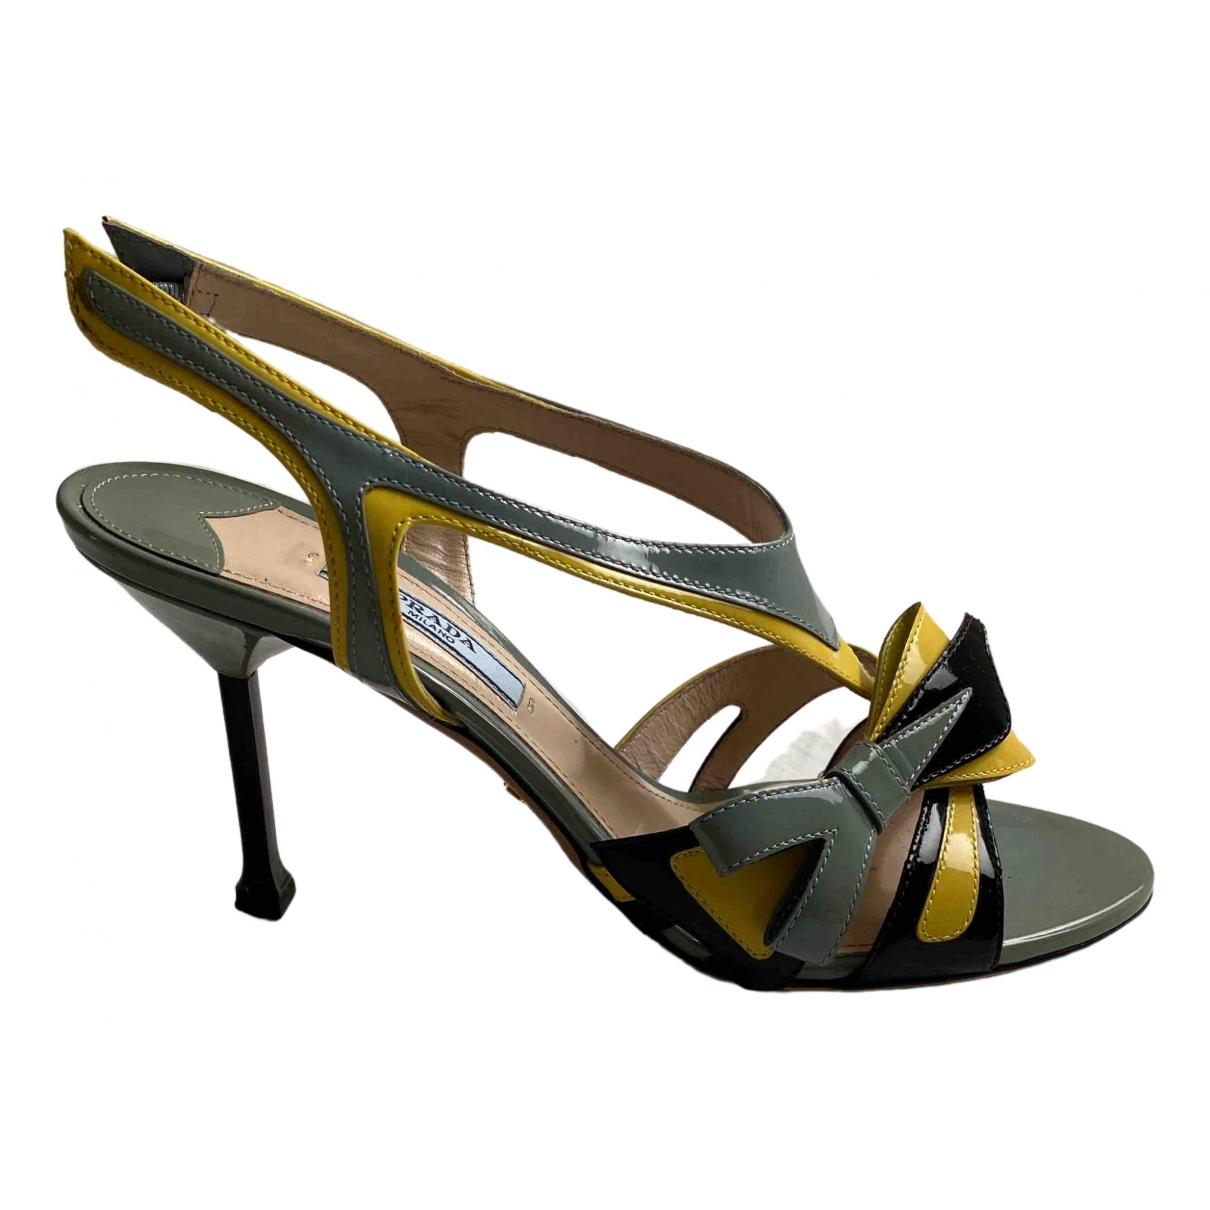 Prada Flame Green Patent leather Sandals for Women 37.5 EU